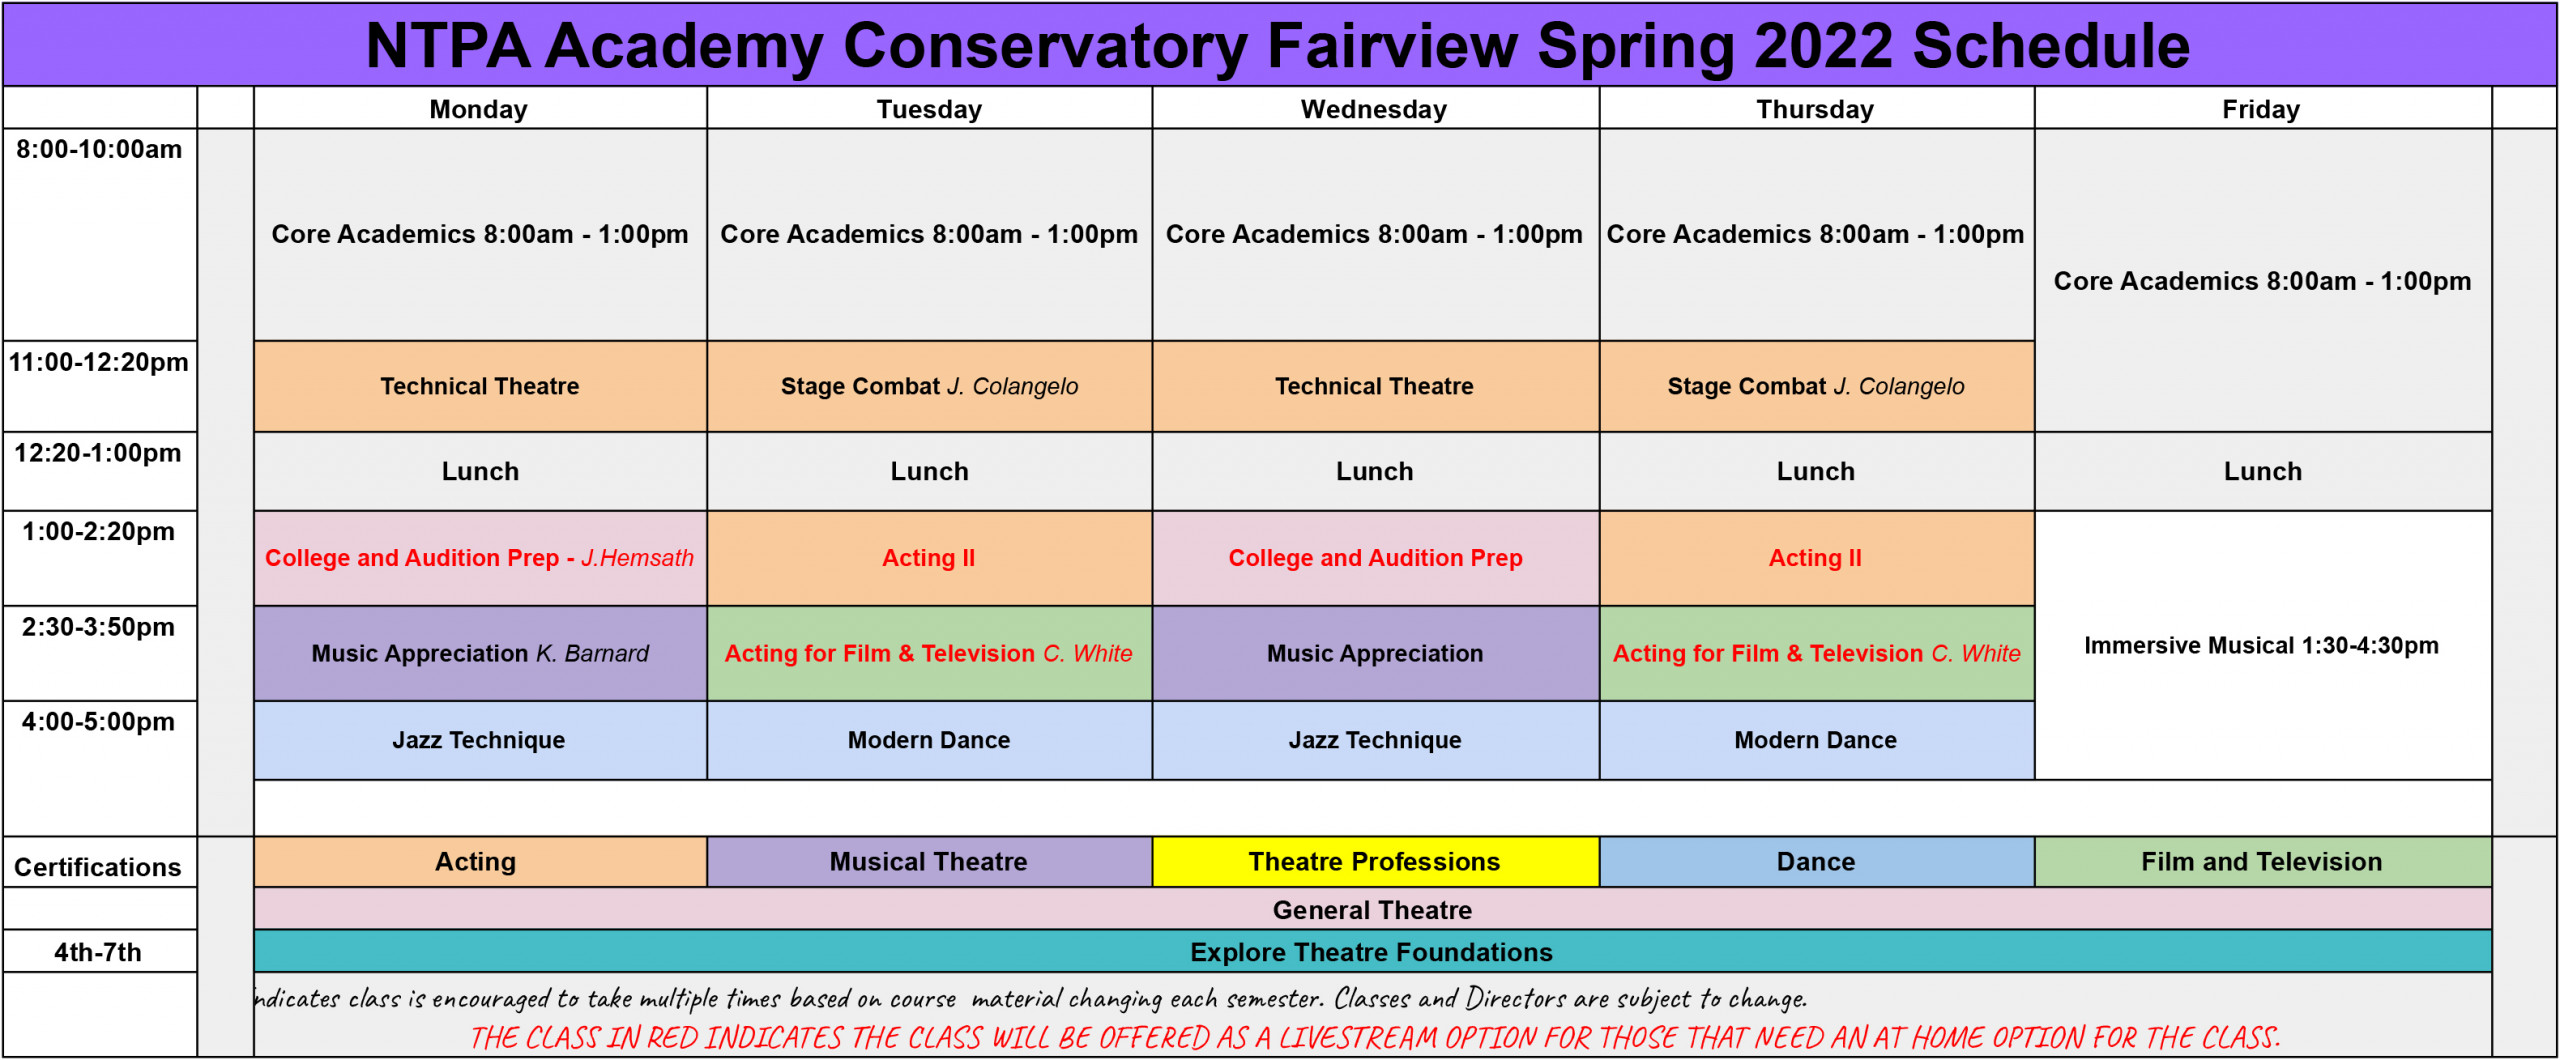 NTPA Academy fairview Spring 2022 Schedule